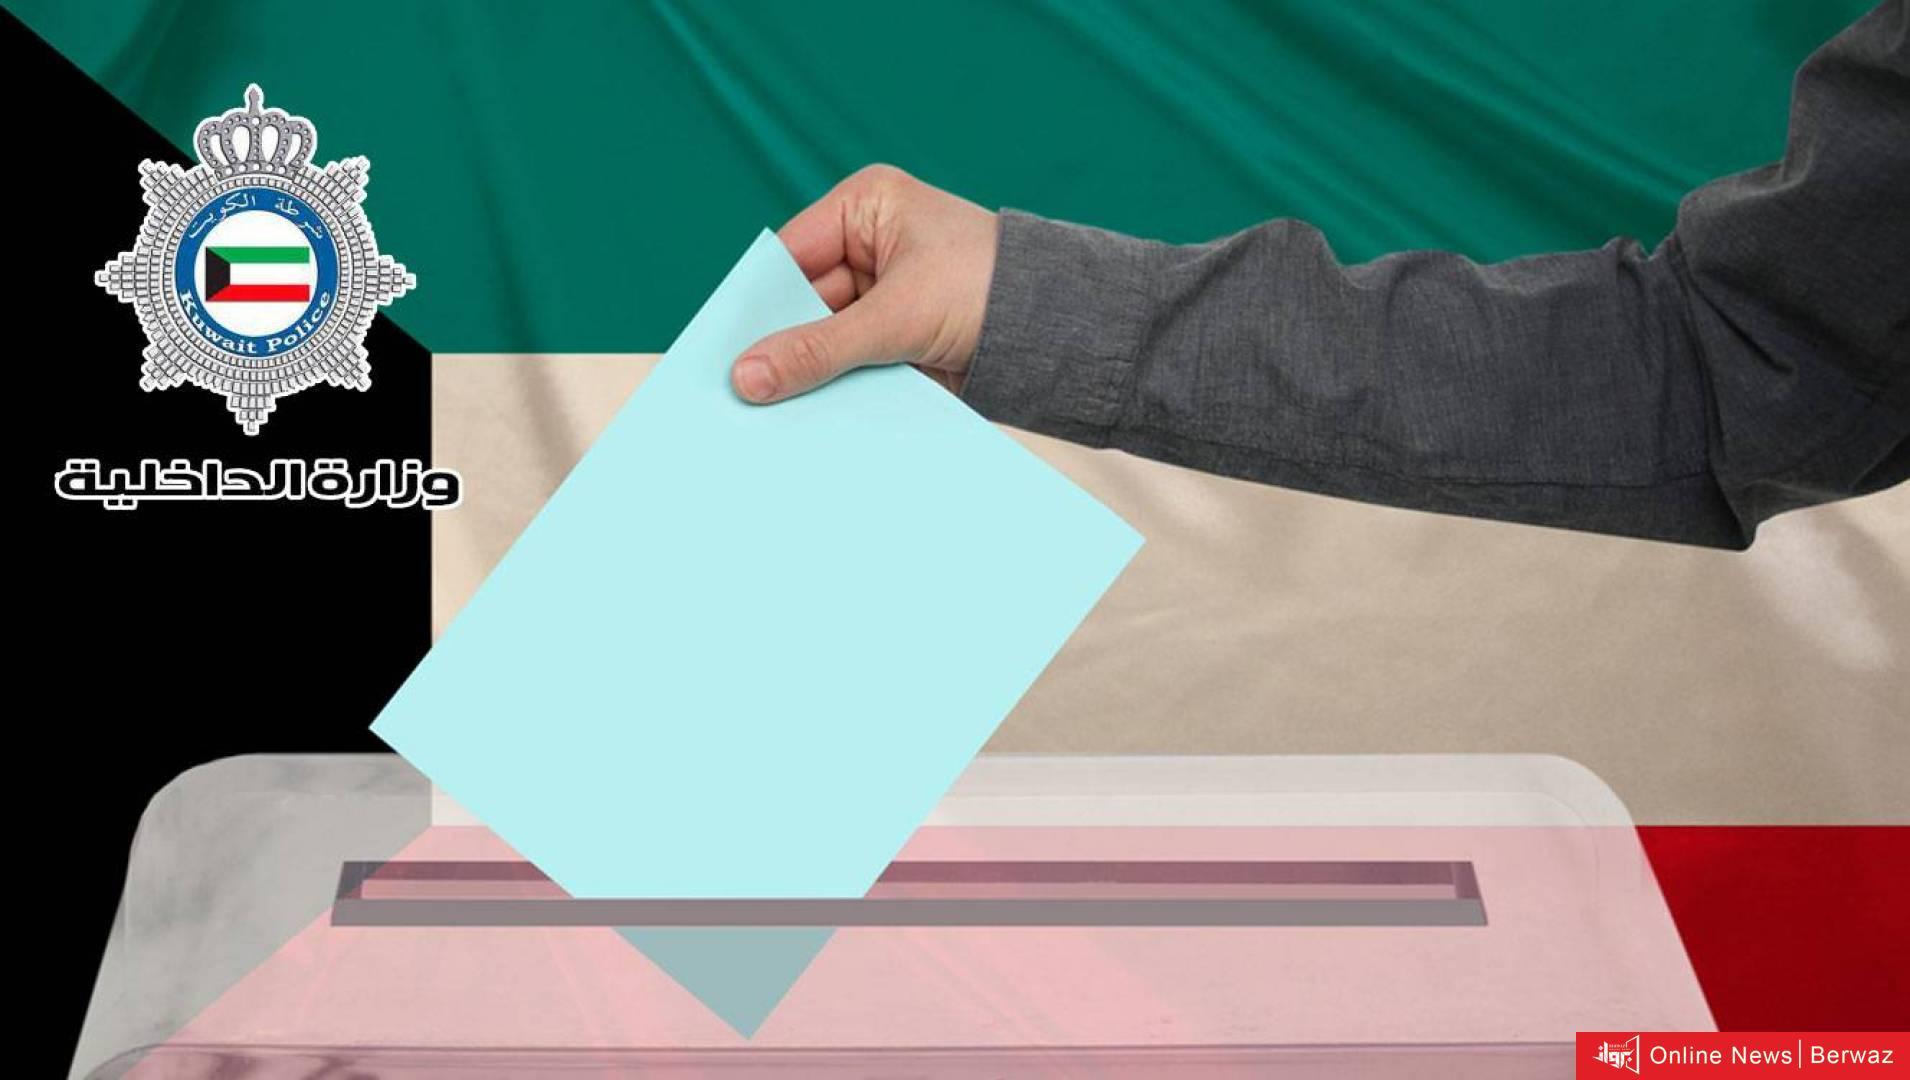 8 389851 highres - تعرف على المرشحين الأوائل لانتخابات الأمة 2020 وفقا للإدارة العامة للانتخابات